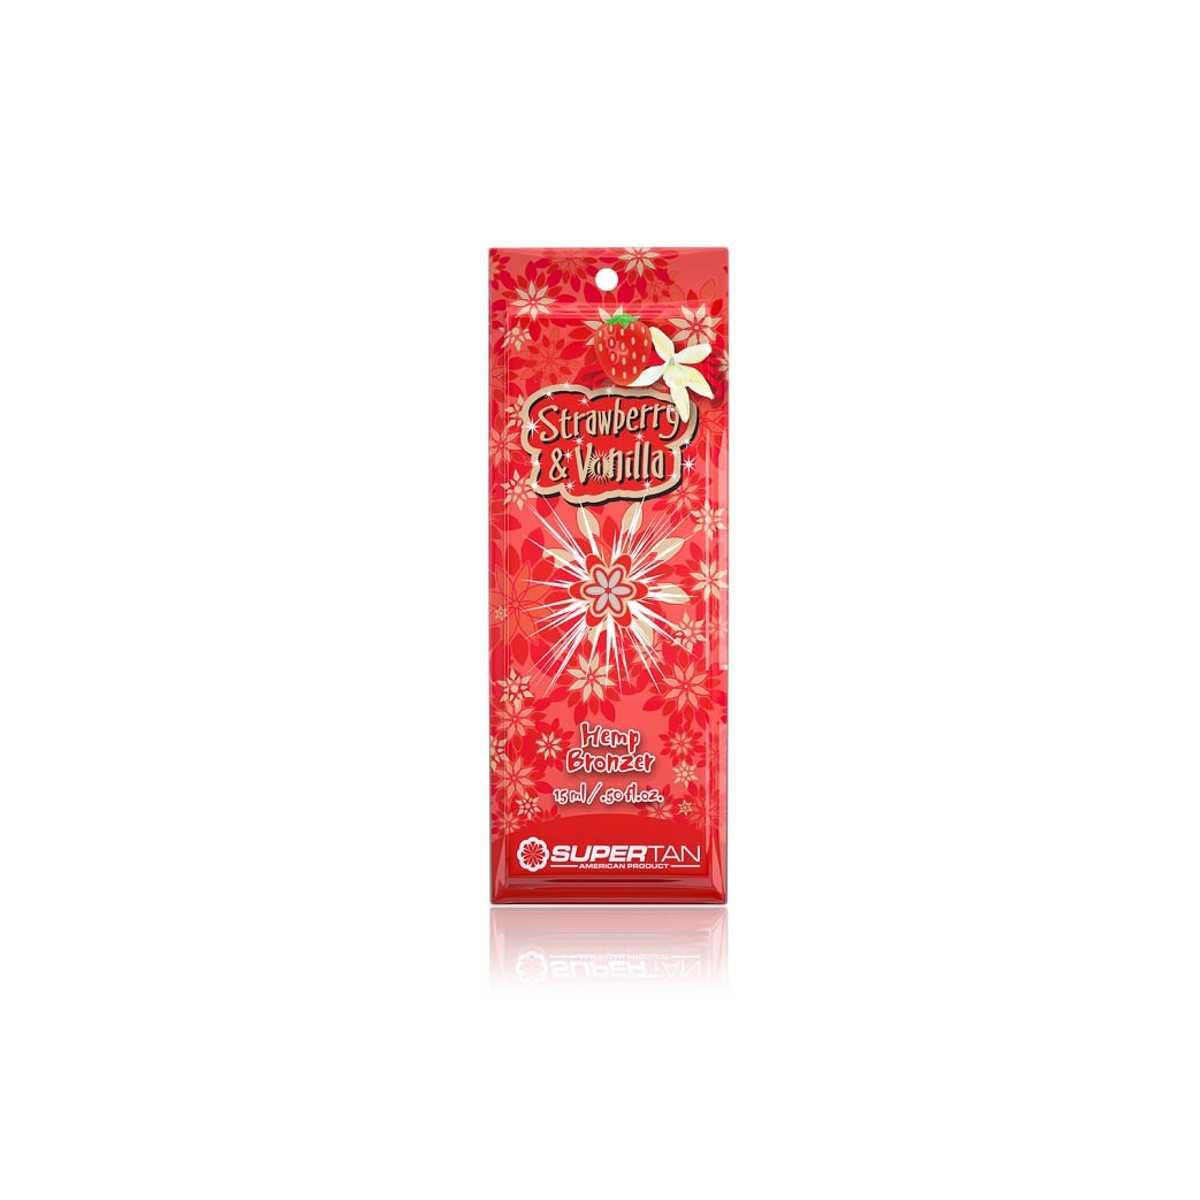 Strawberry & Vanilla 15ml